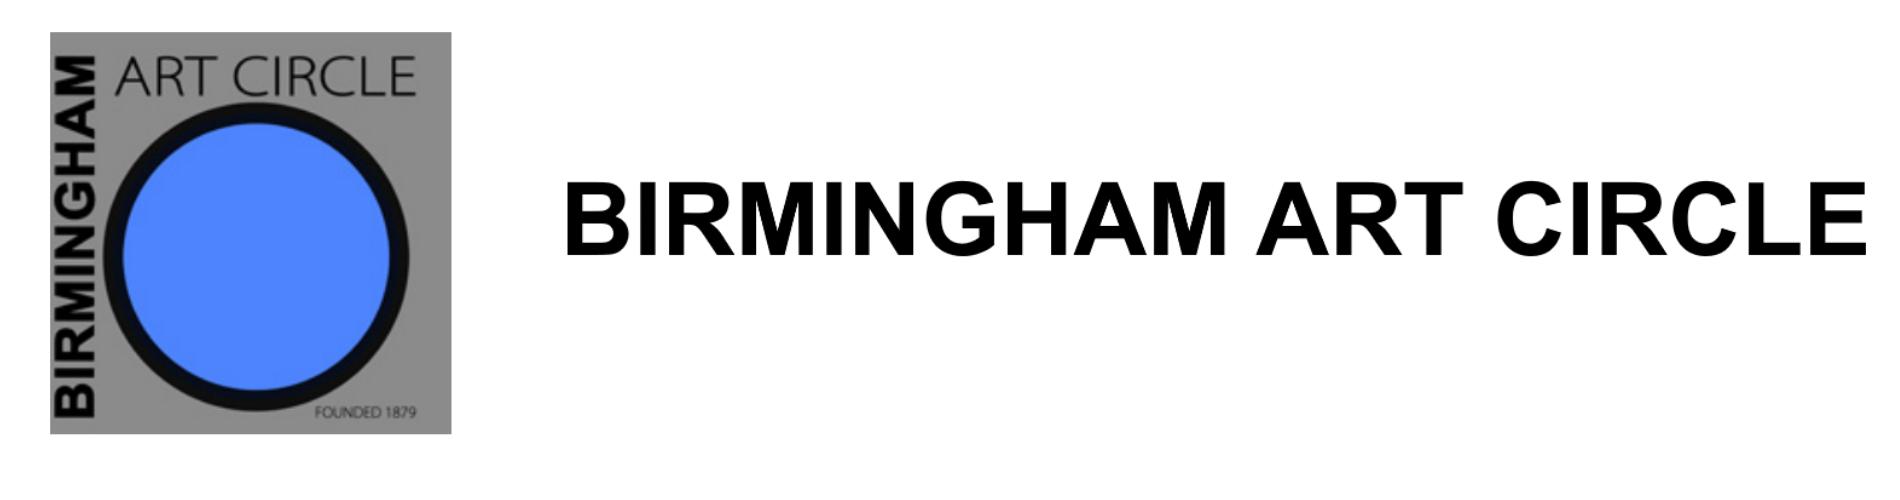 Birmingham Art Circle